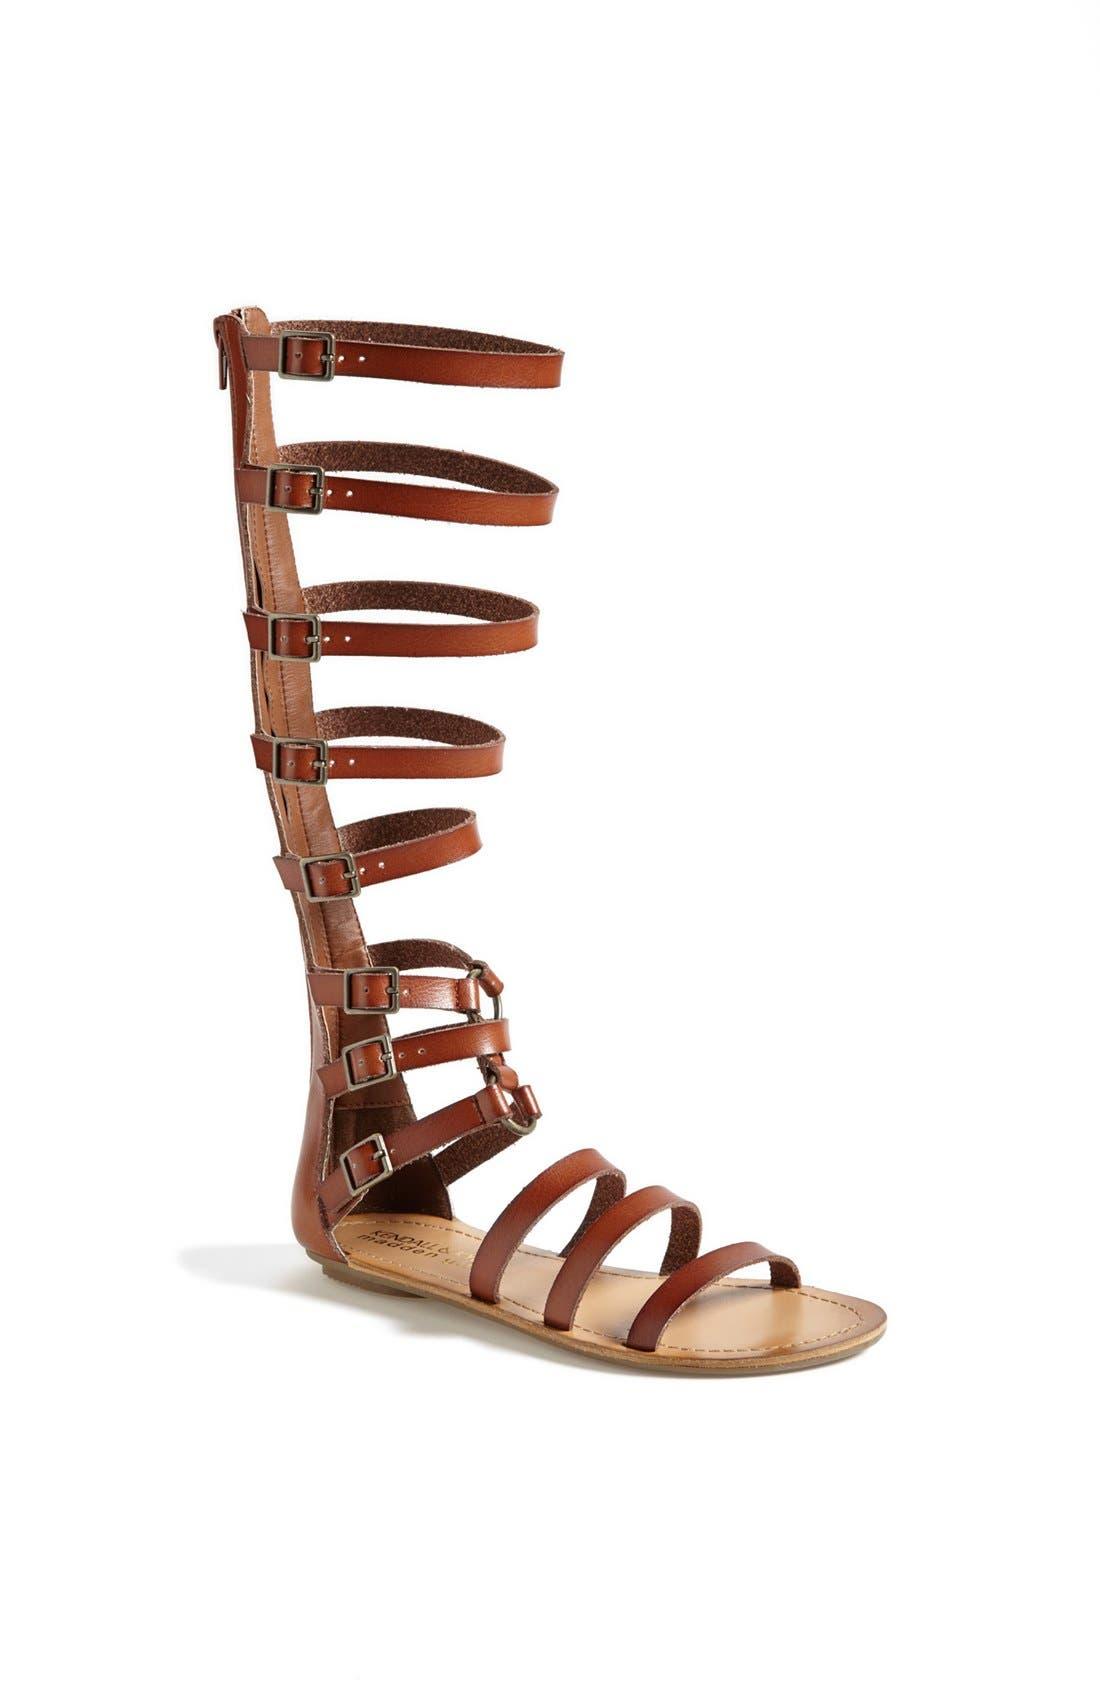 Main Image - KENDALL + KYLIE Madden Girl 'Seriious' Sandal